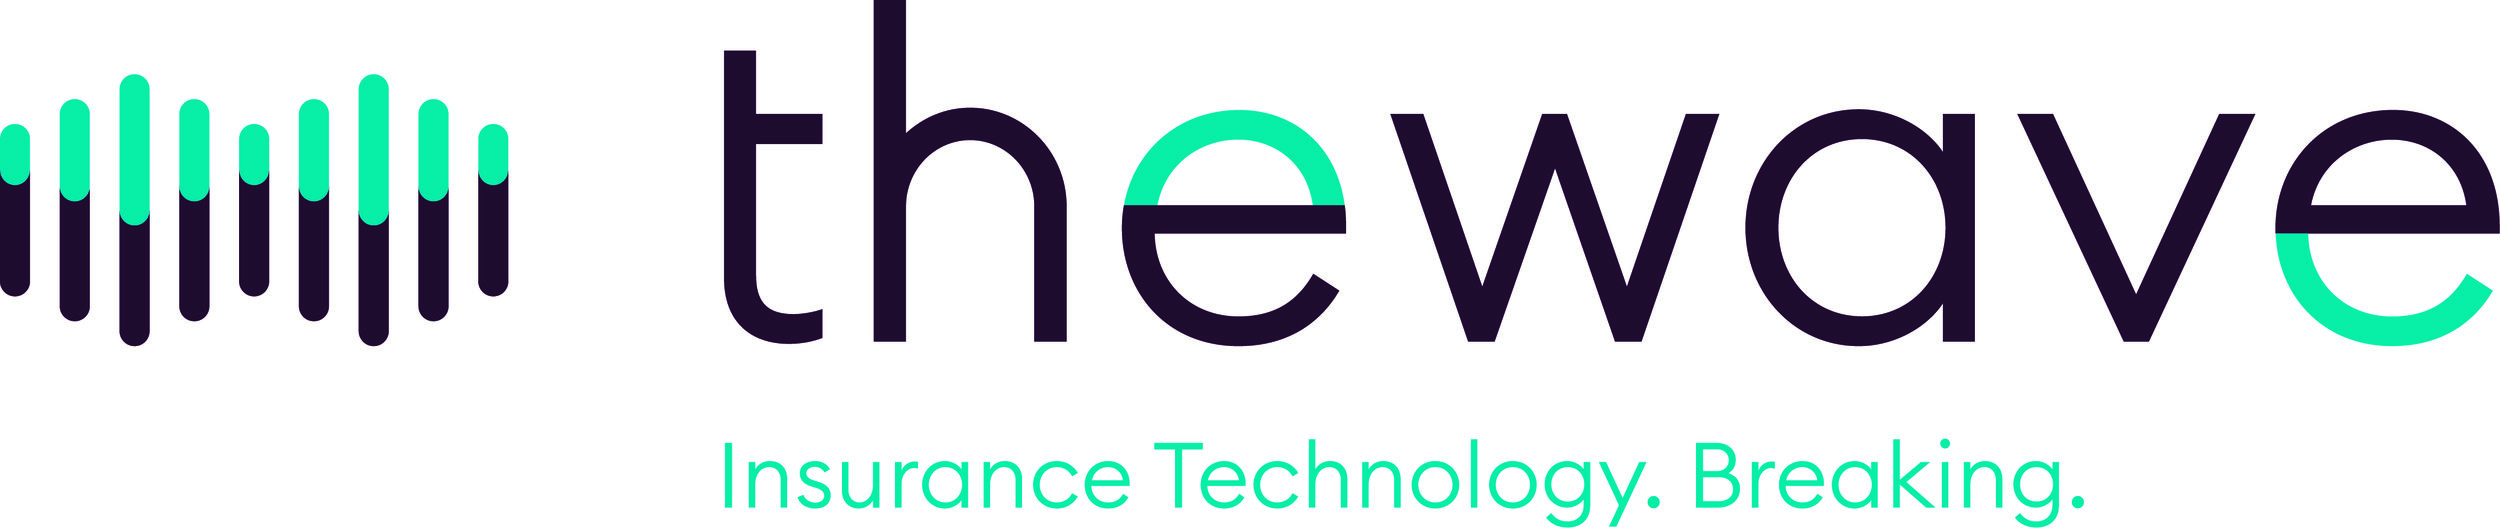 Logo_Thewave.jpg